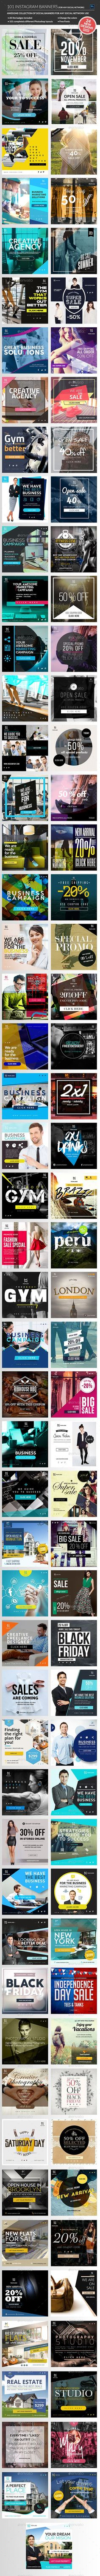 Get Free Internet Marketing Ebooks Web Design, Web Banner Design, Social Media Design, Web Banners, Promotional Banners, Promotional Design, Social Media Banner, Social Media Template, Newsletter Design